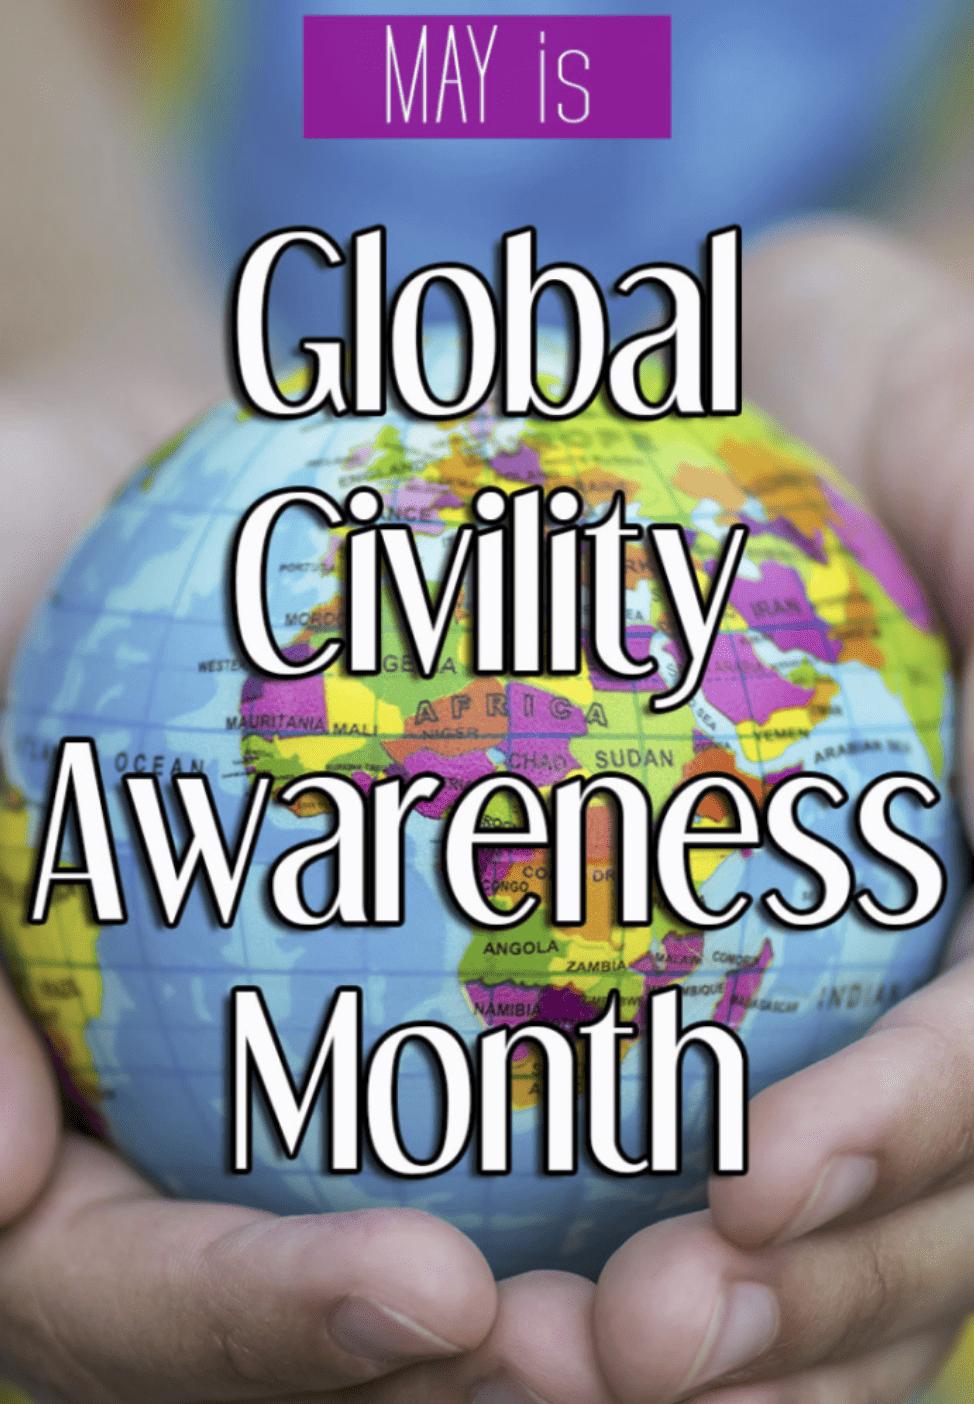 Global-civility-awareness-month